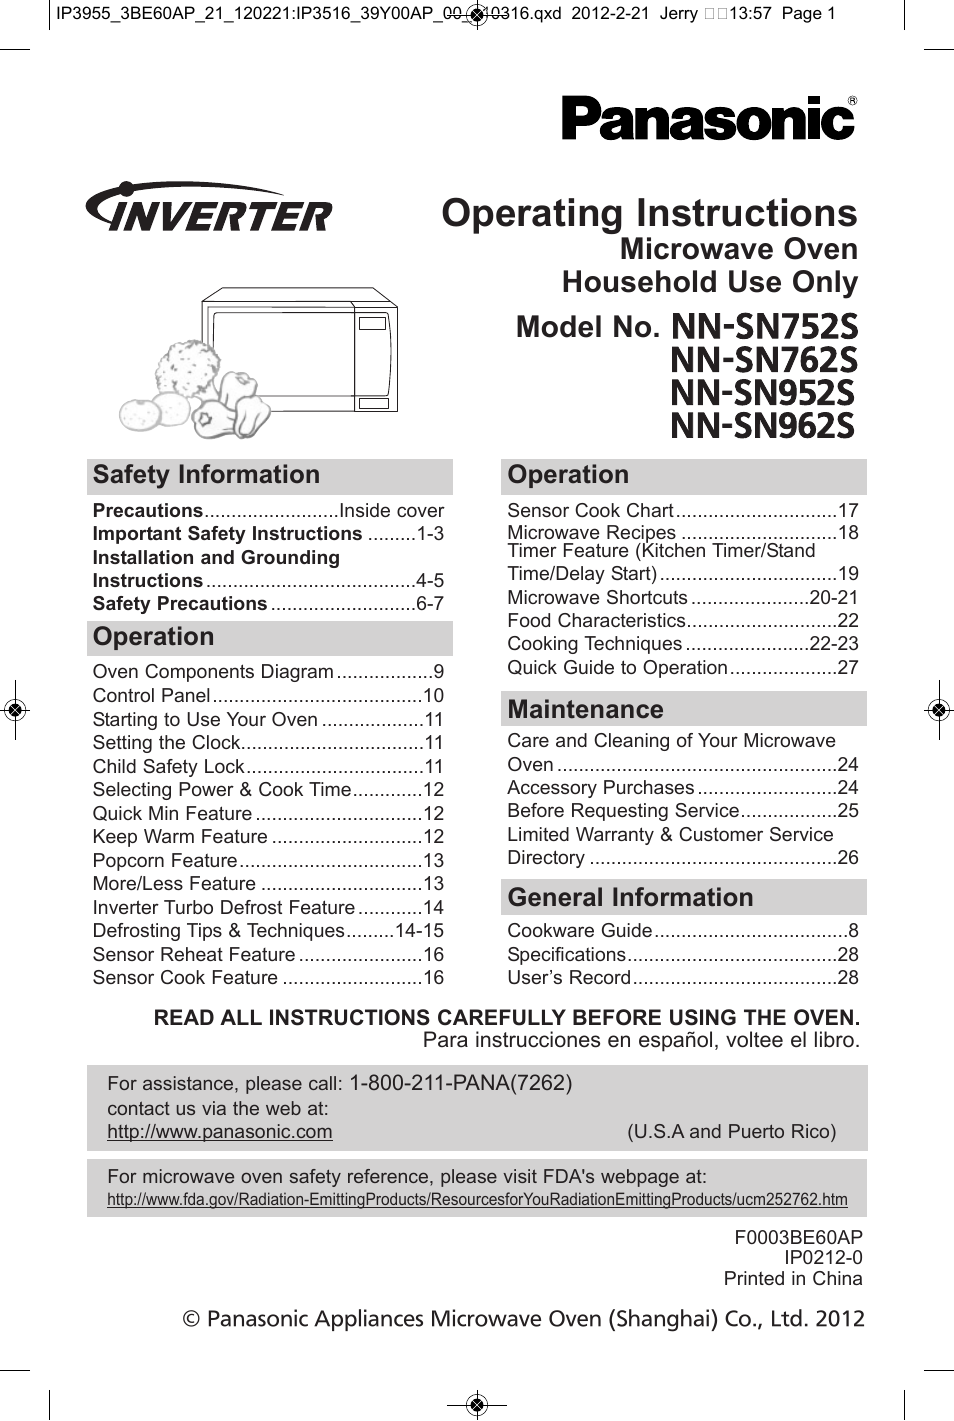 Panasonic Microwave Inverter Manual Full Image For